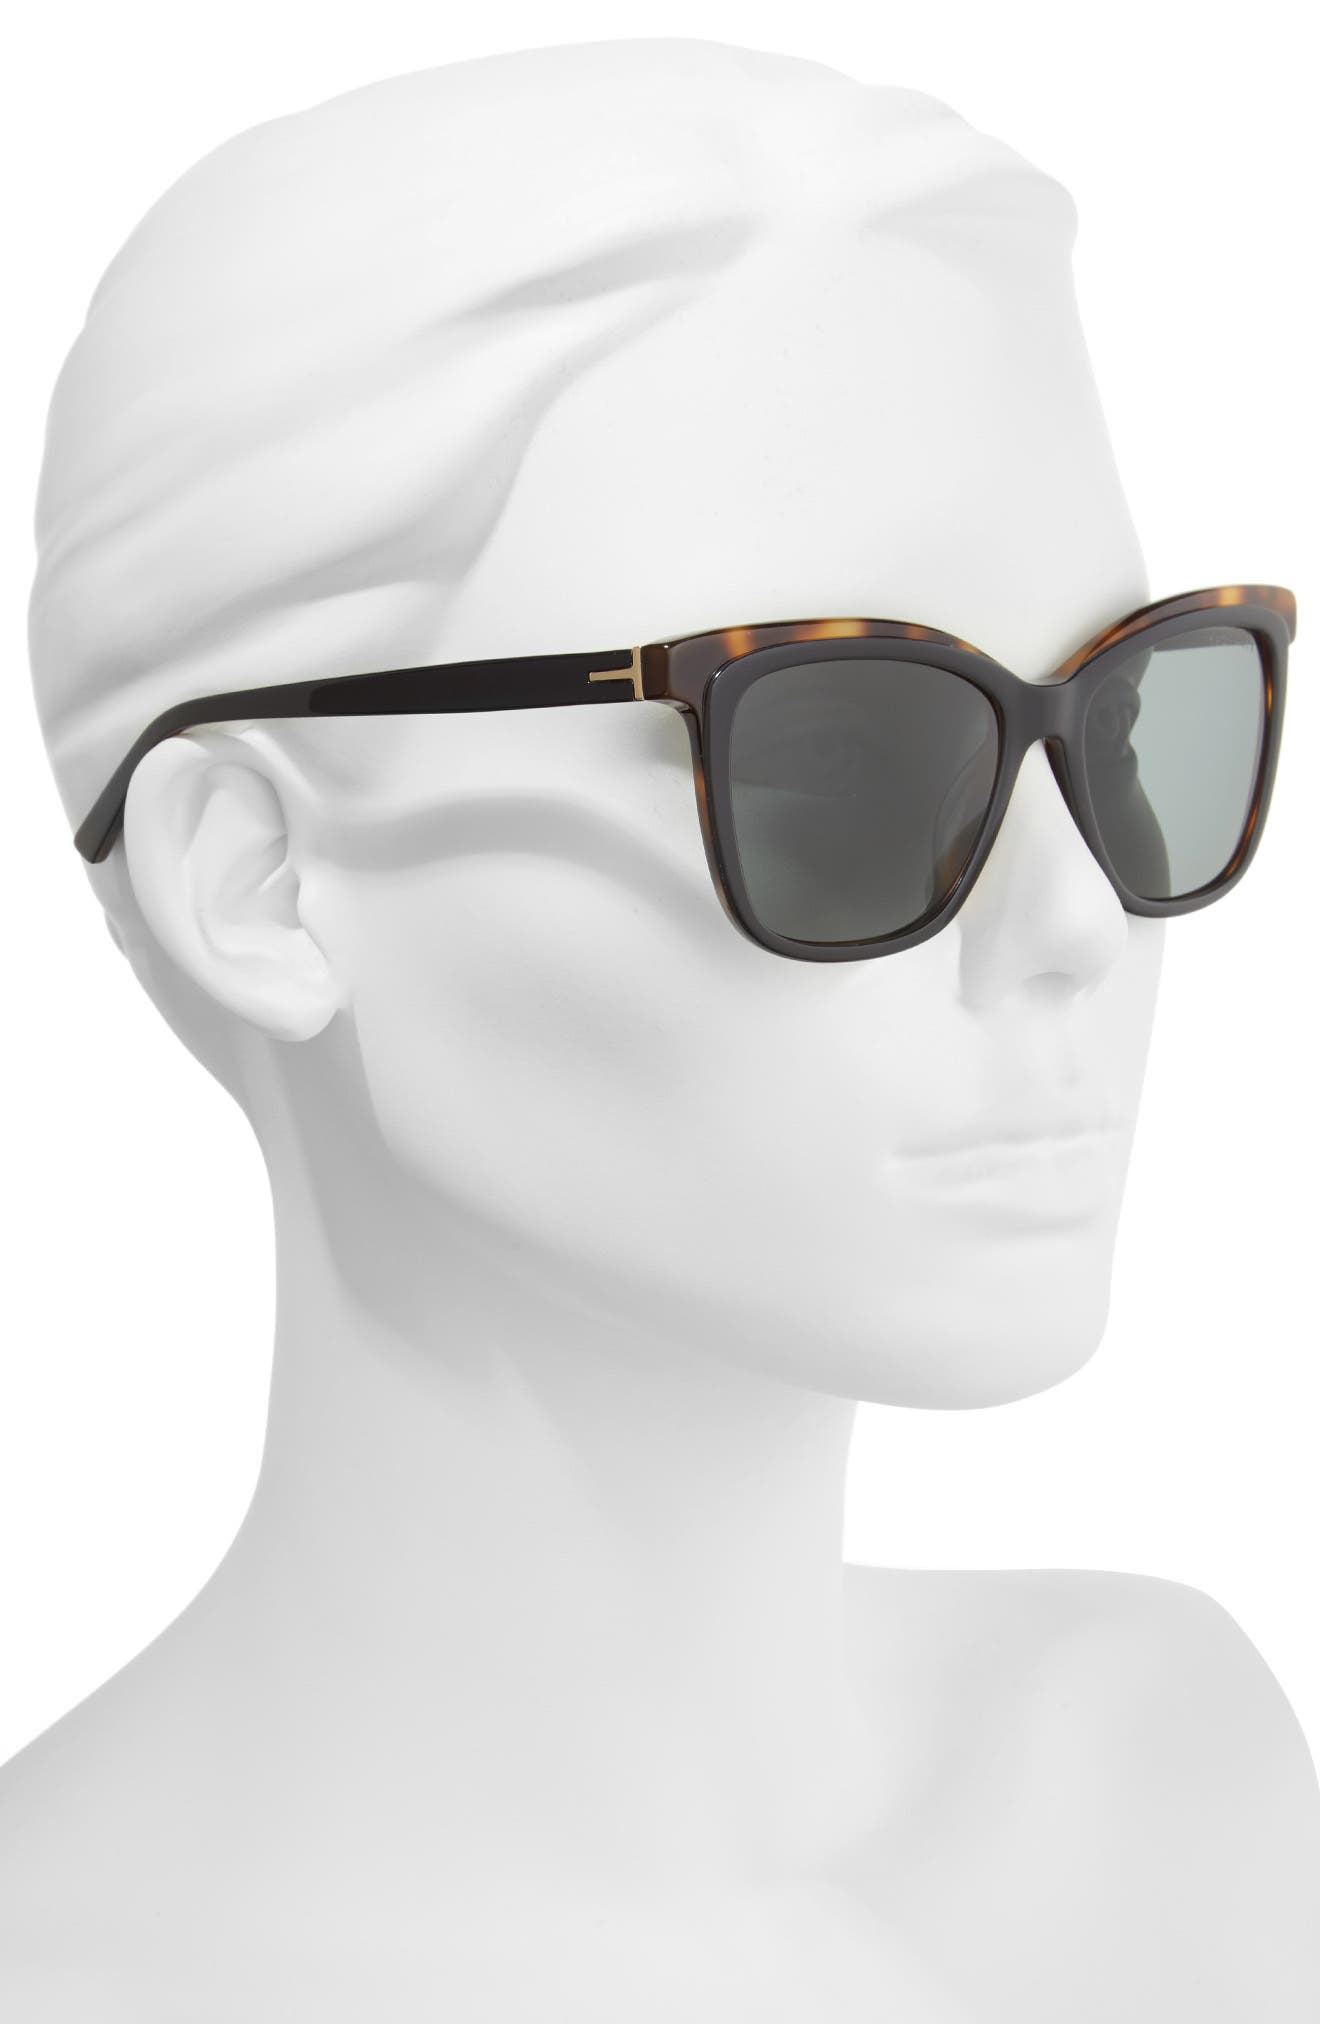 54mm Polarized Cat Eye Sunglasses,                             Alternate thumbnail 2, color,                             002